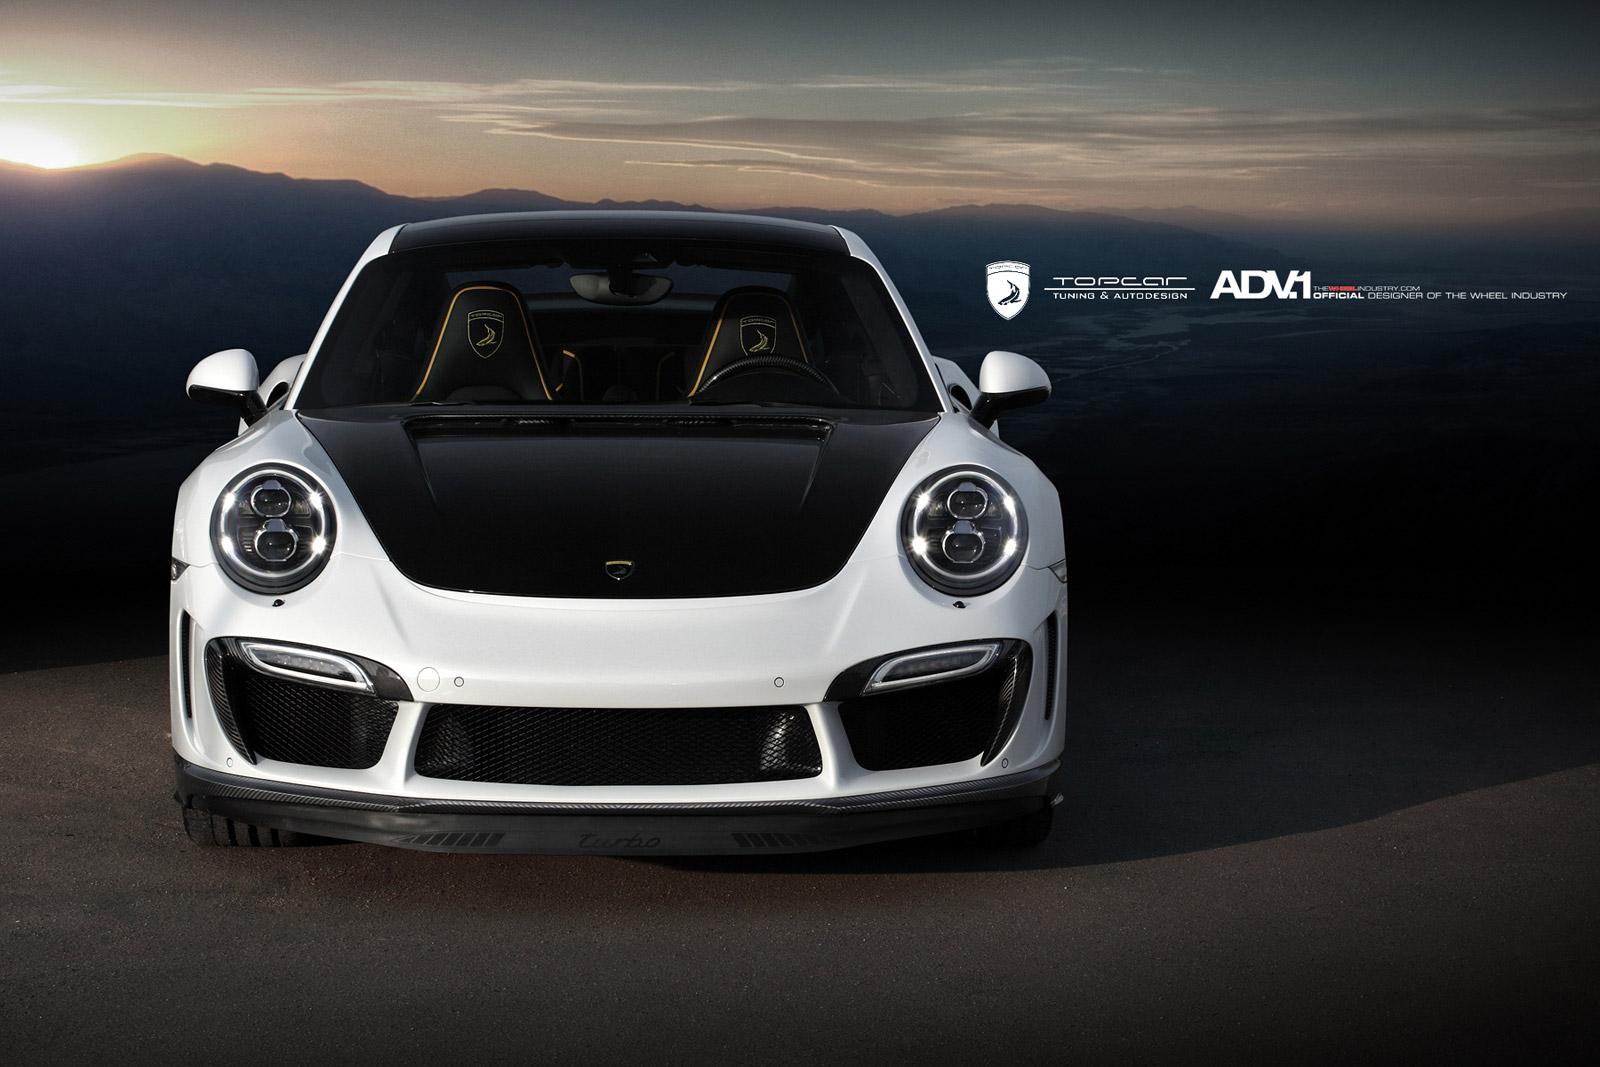 porsche-911-turbo-typ-991-topcar-stinger-gtr-019